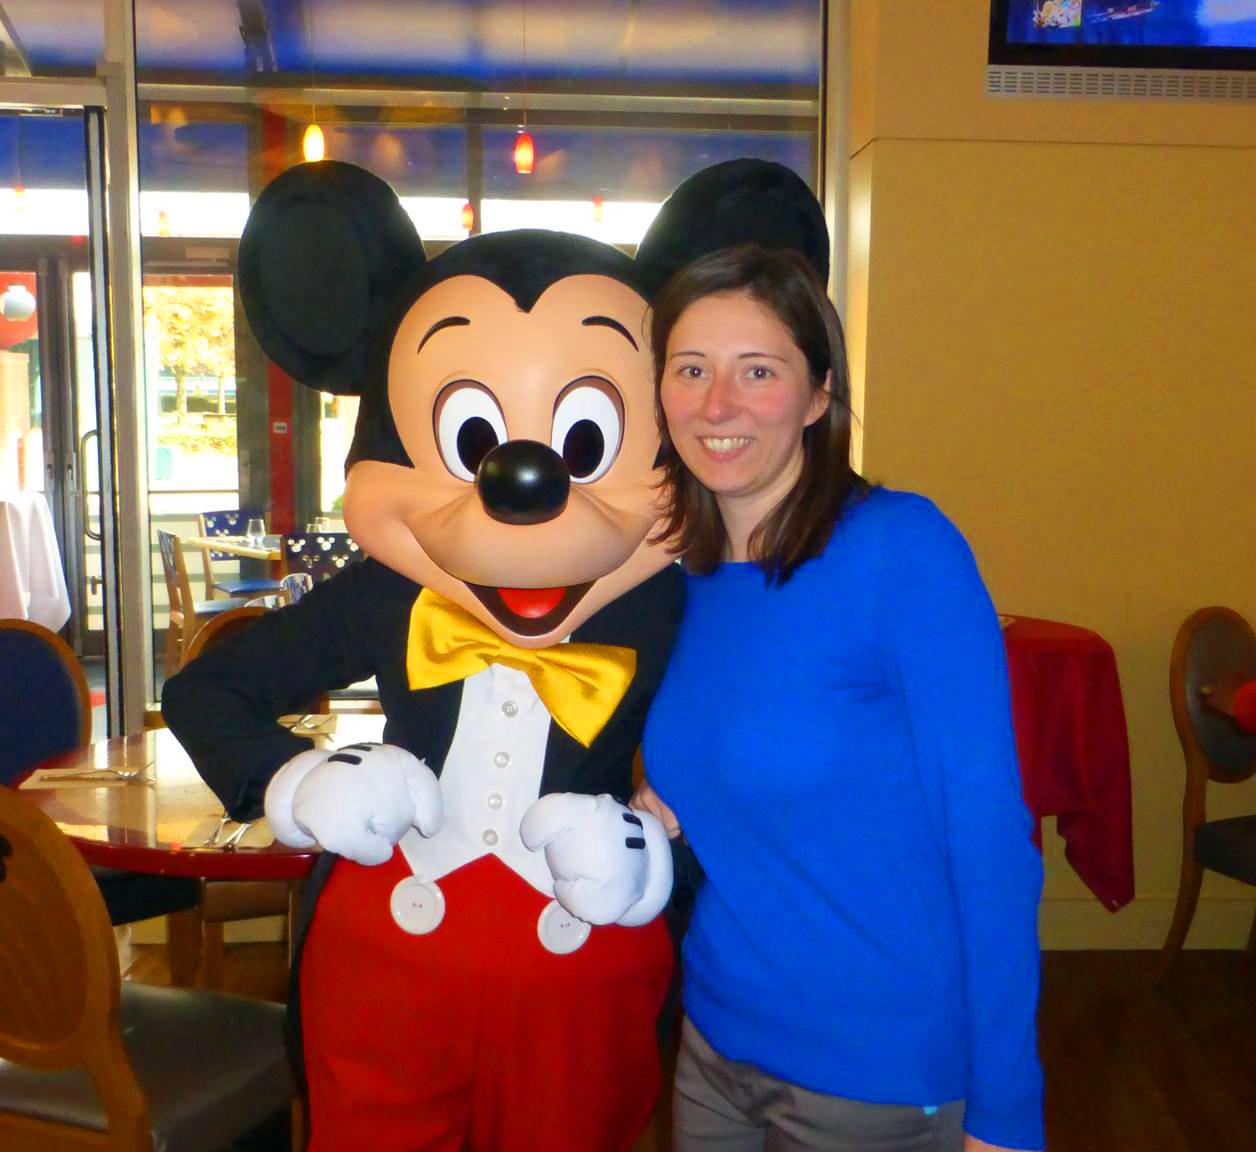 Mickey Mouse at Cafe Mickey at Disneyland Paris' Disney Village